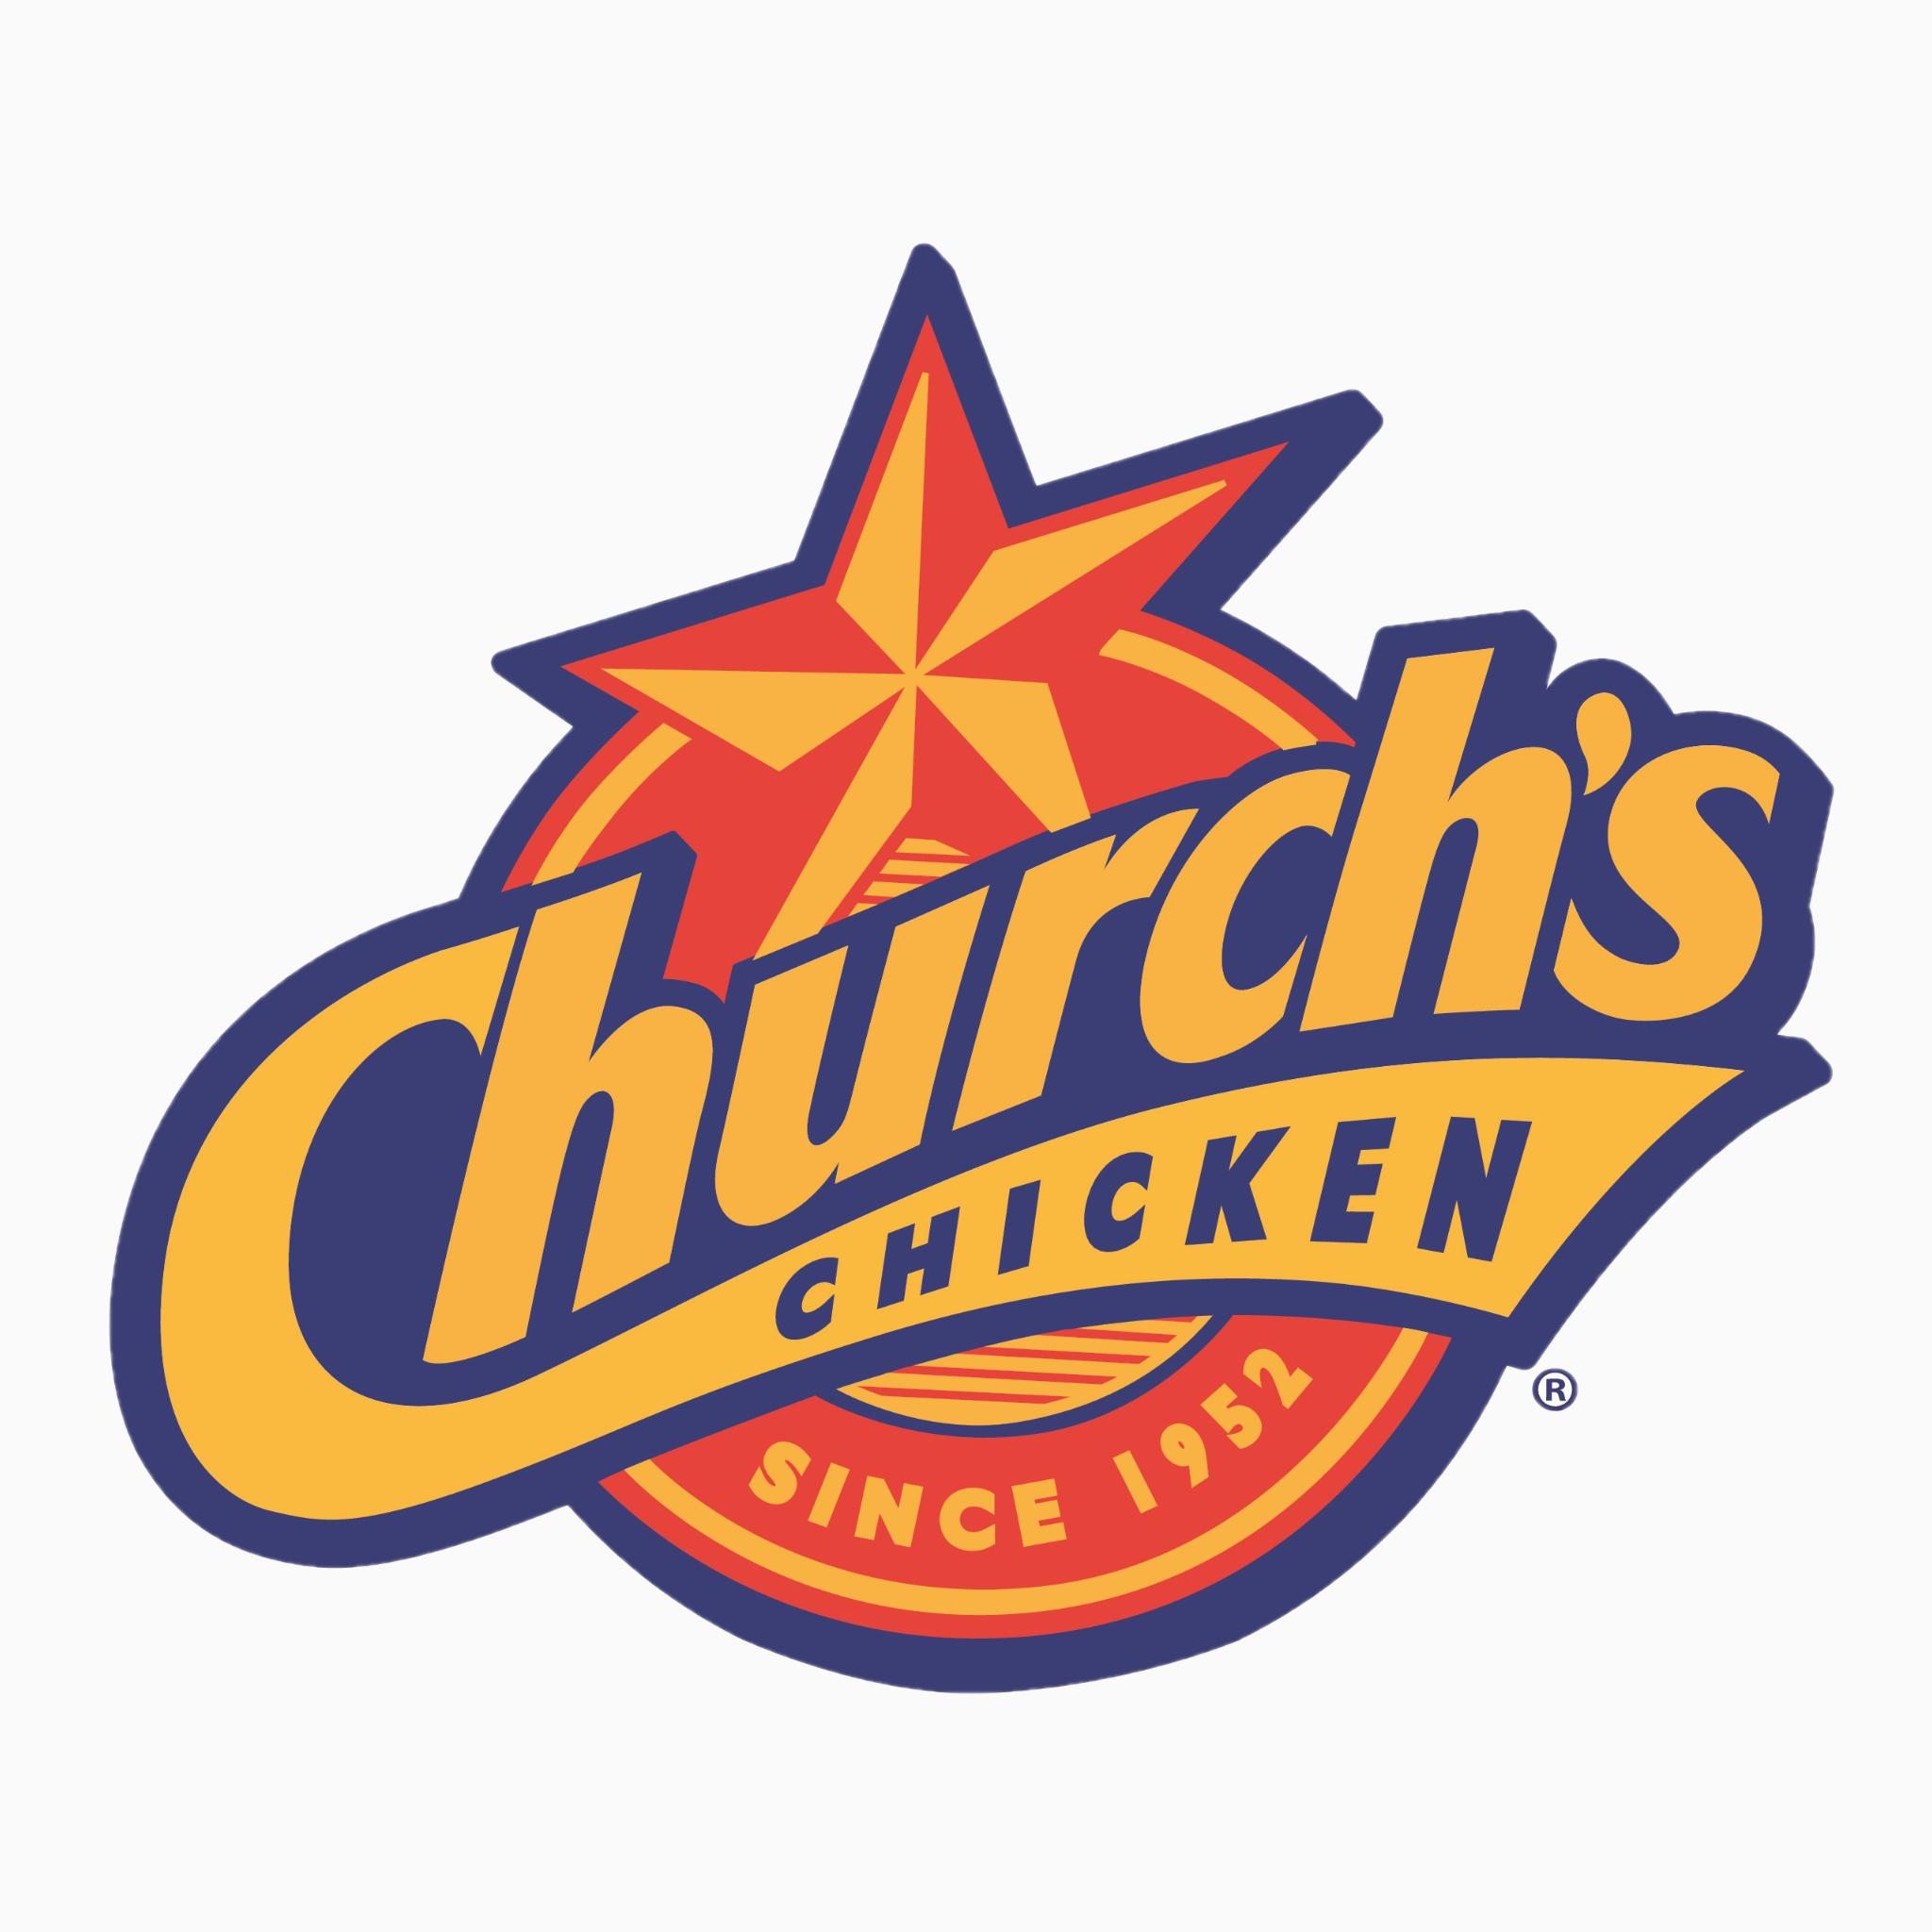 Churchs logo new background.png